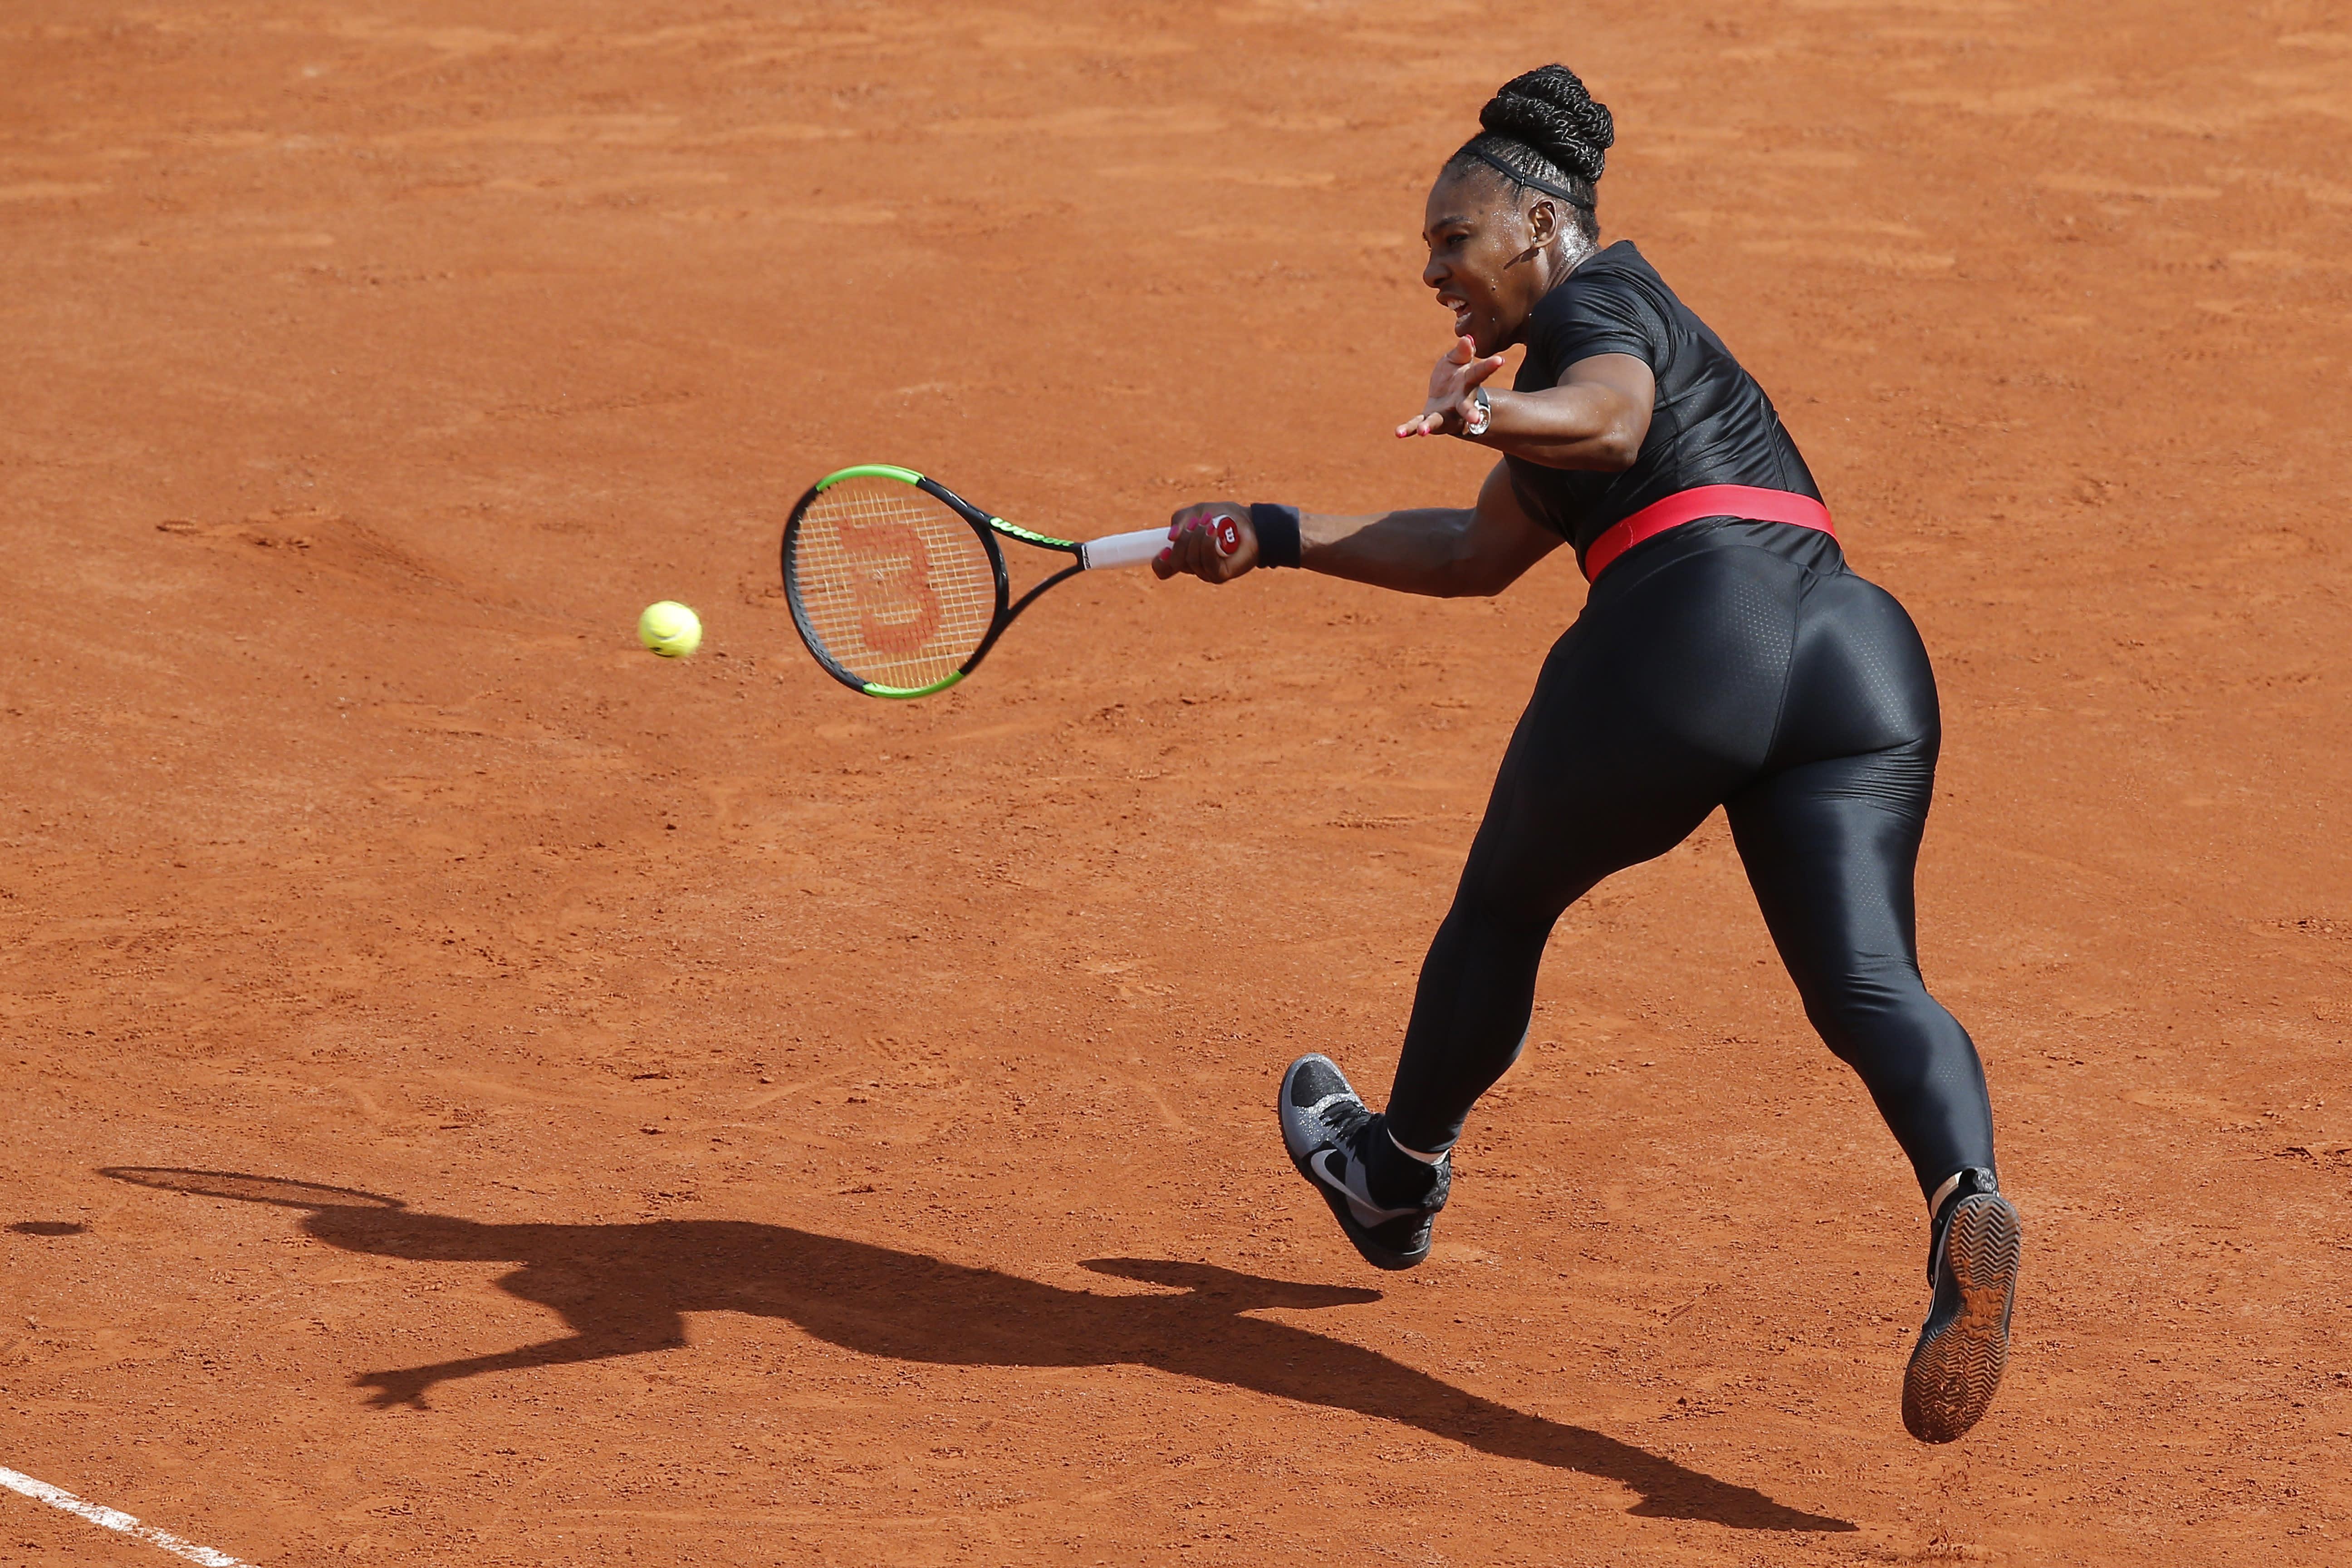 b9e4ec18ccf Serena Williams returns to tennis dressed like a superhero  Video